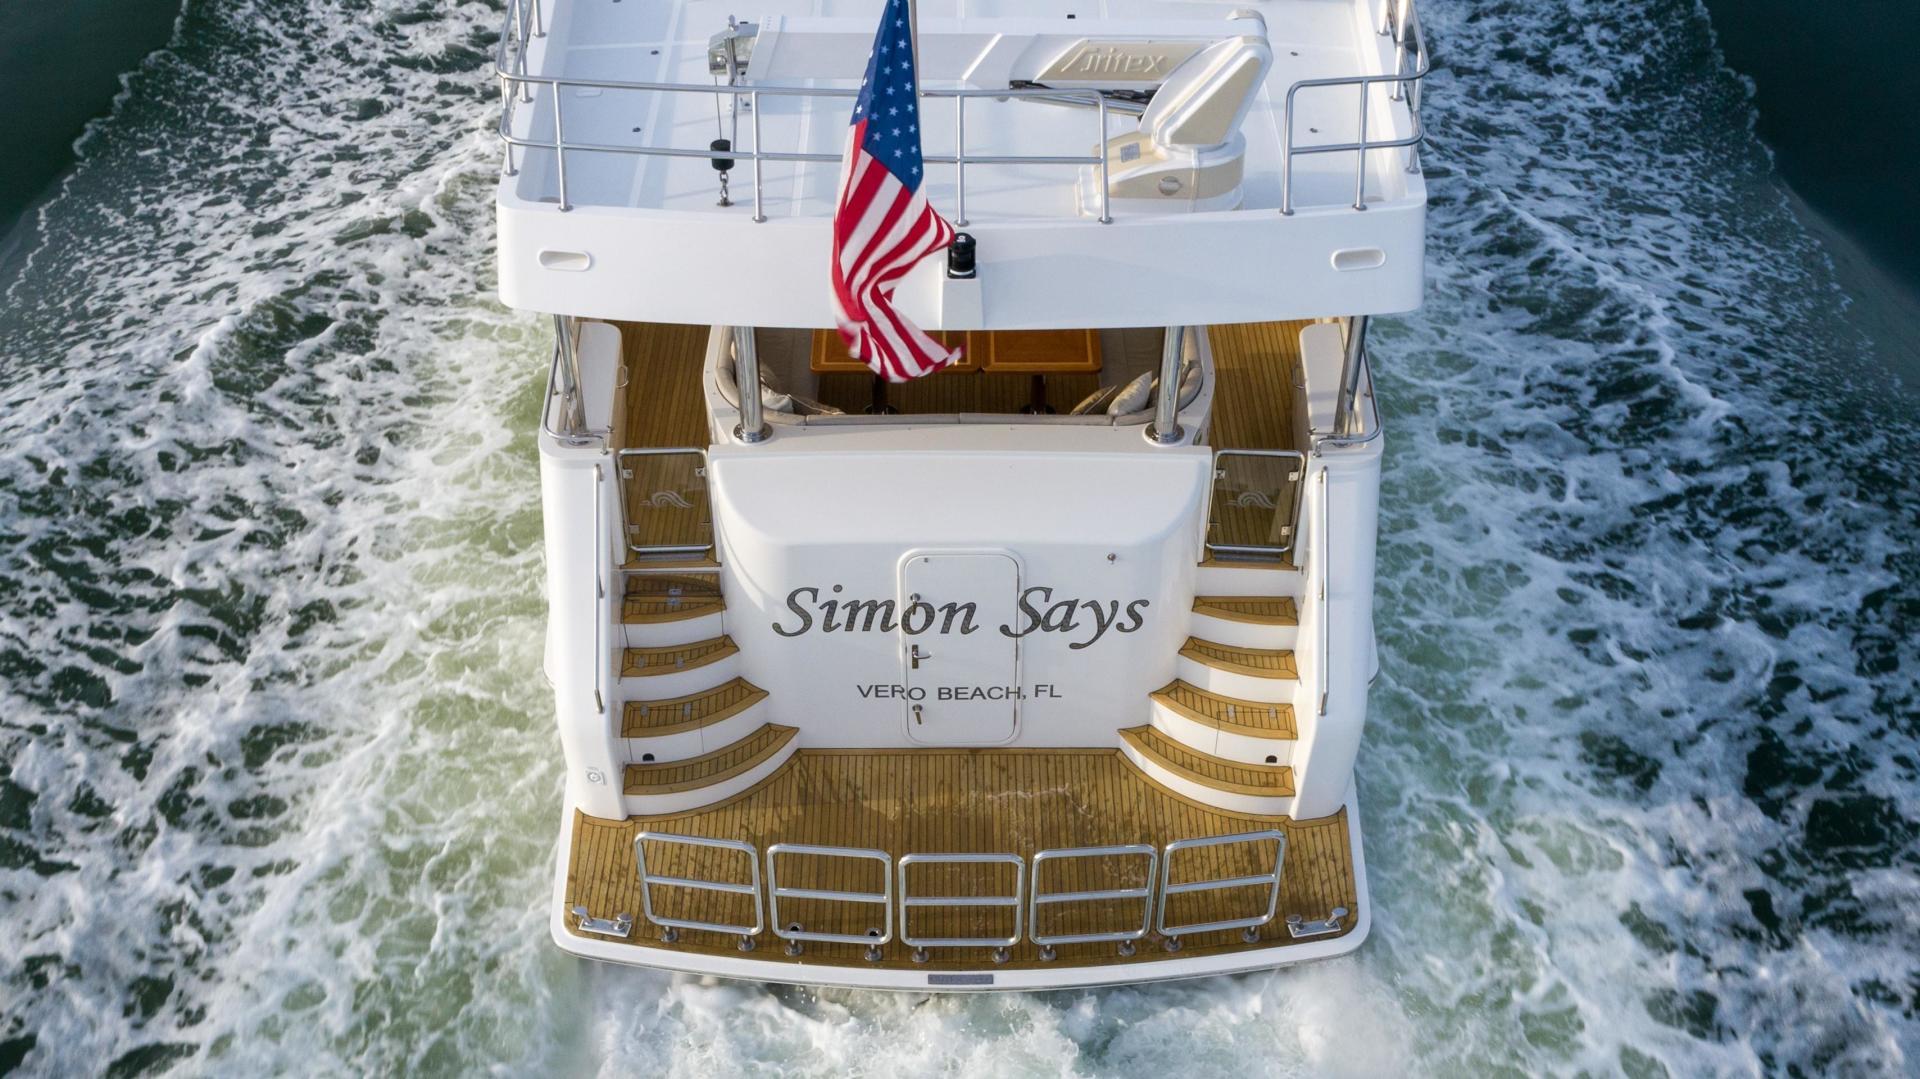 Outer Reef Yachts-860 DBMY 2017-Simon Says Vero Beach-Florida-United States-1488226 | Thumbnail